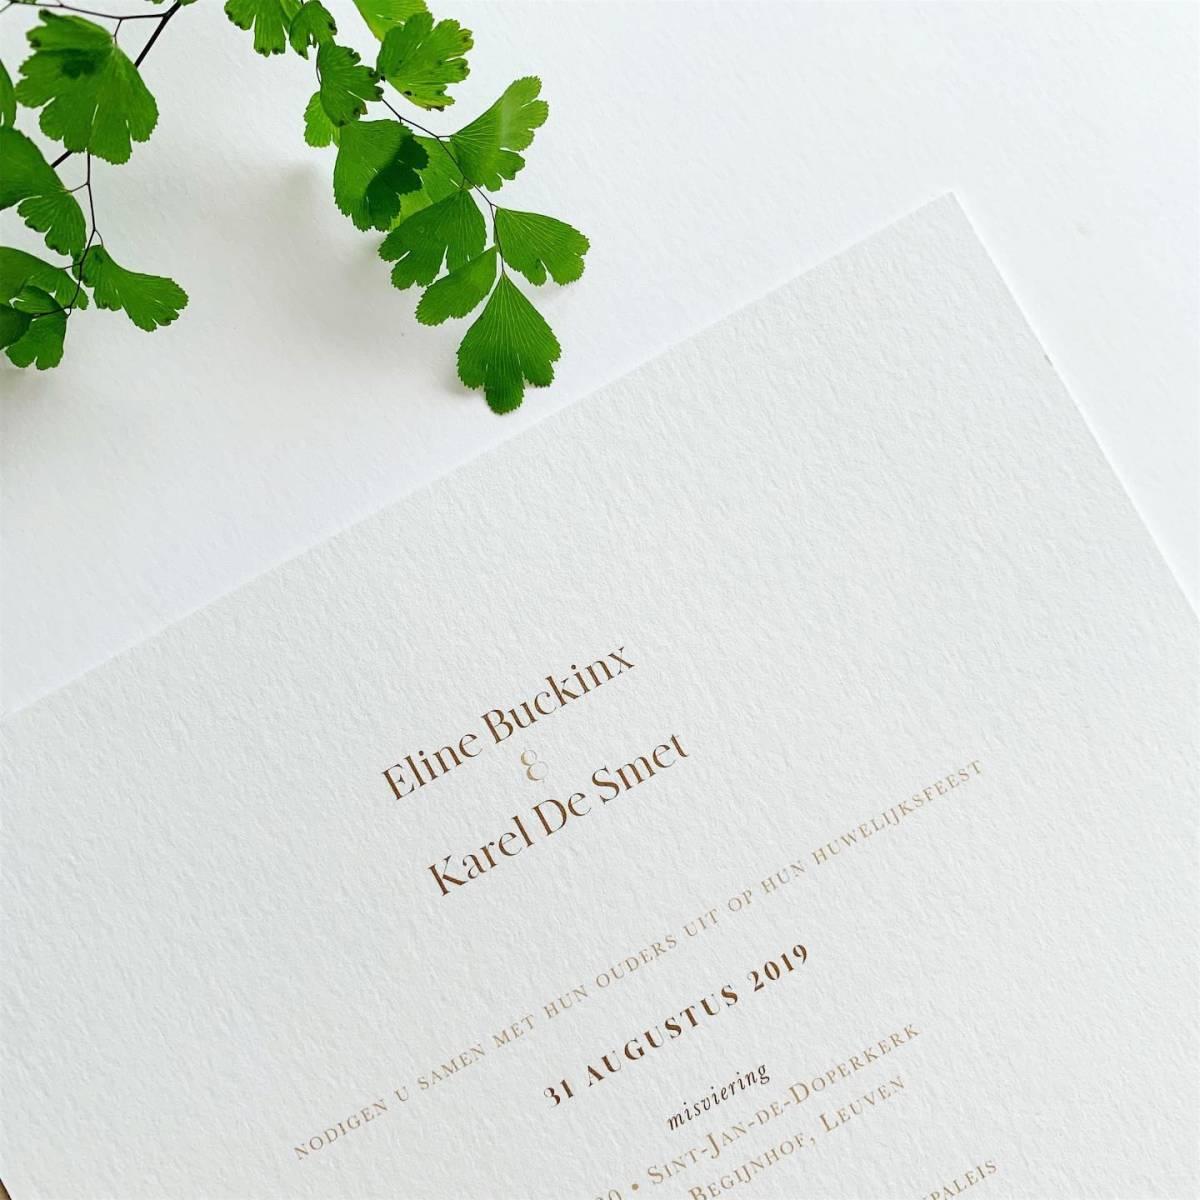 Scarabar - Trouwuitnodiging - Huwelijksuitnodiging - Drukwerk - Huwelijk - Trouw - Bruiloft - House of Weddings - 39